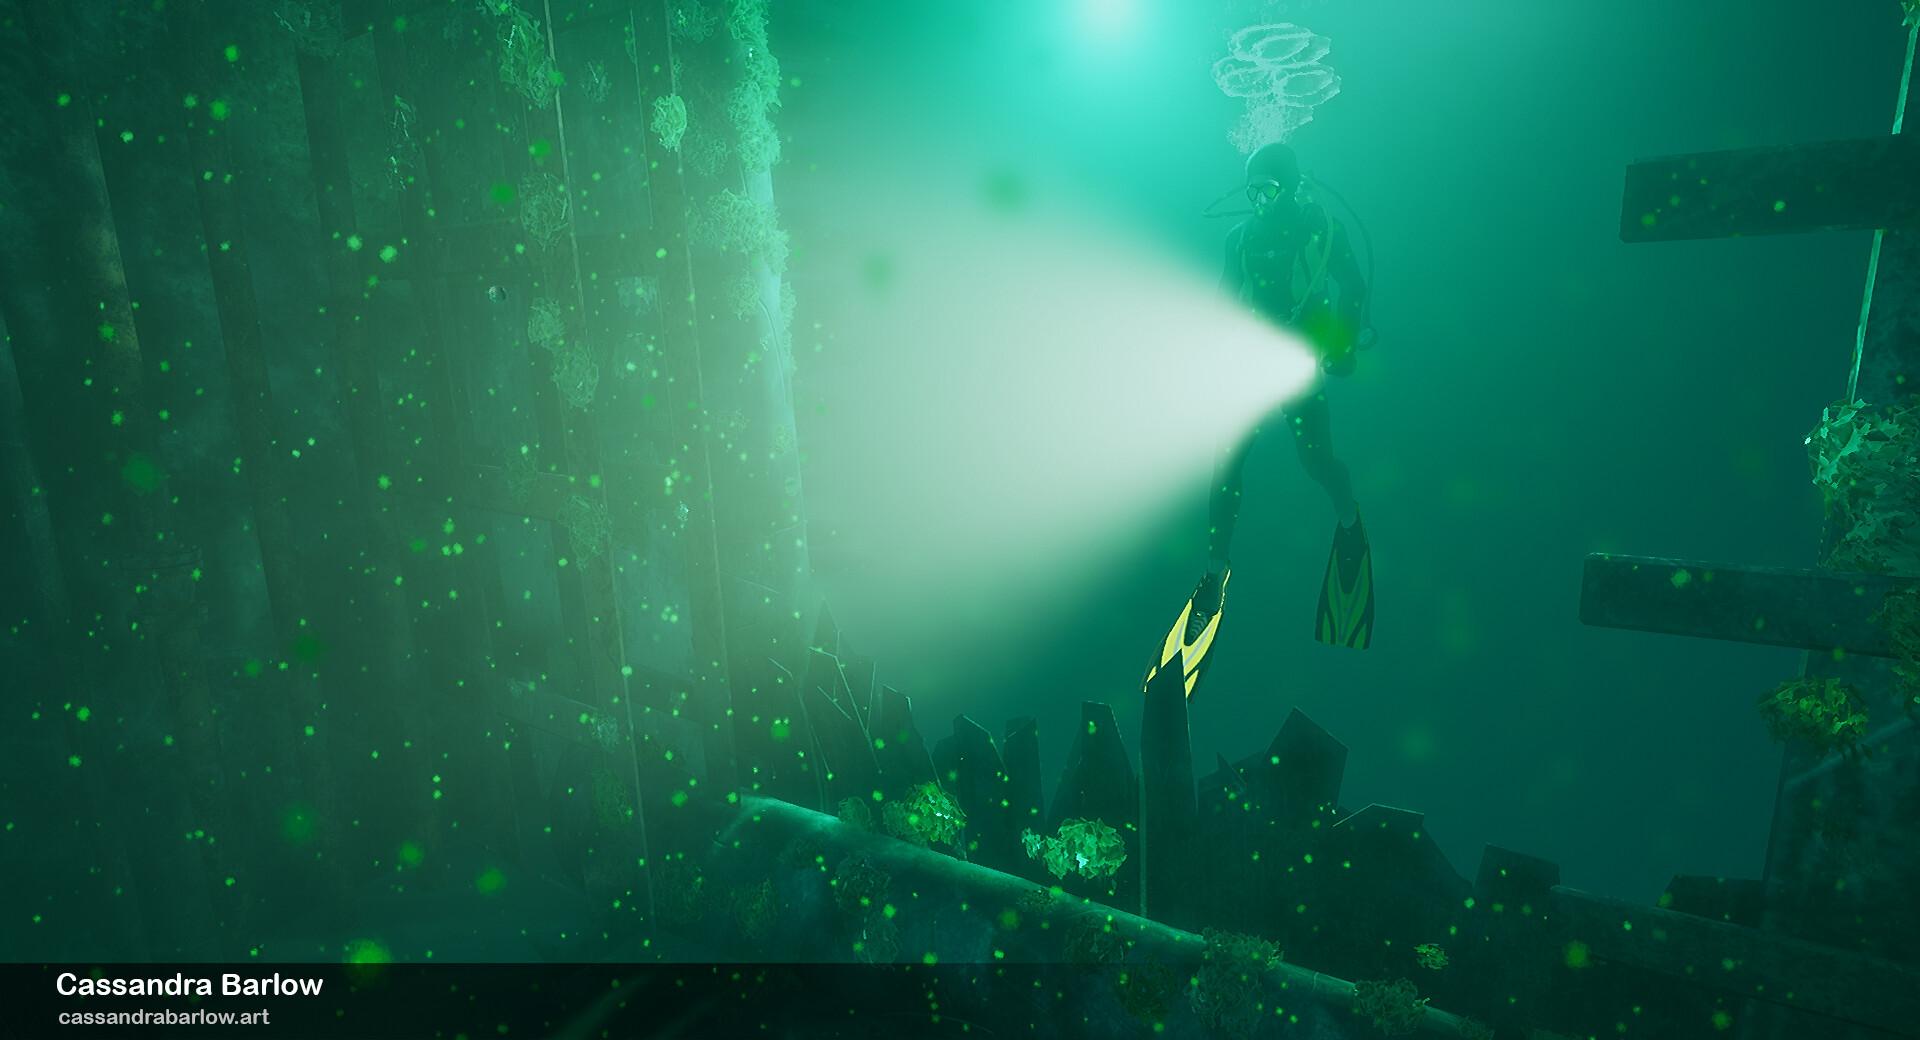 Cassandra barlow cassandrabarlow submarinewreck 1